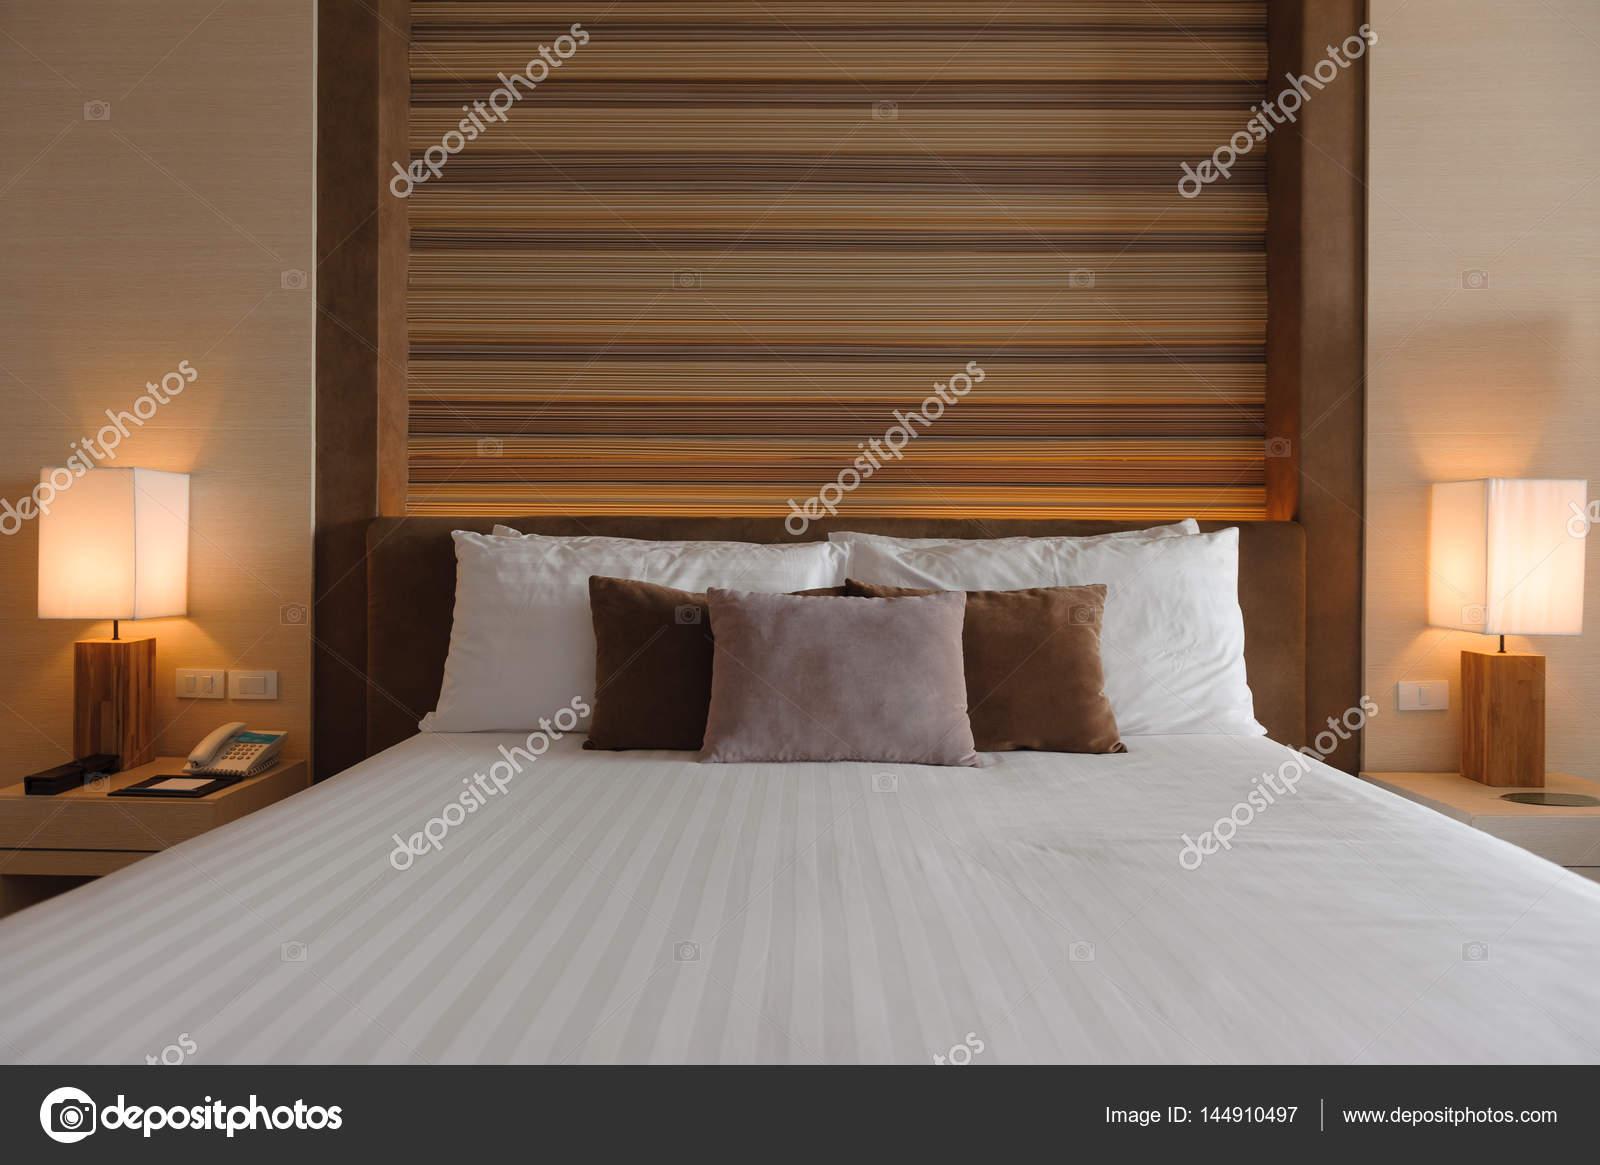 Slaapkamer interieur design moderne stijl u2014 stockfoto © vazaly